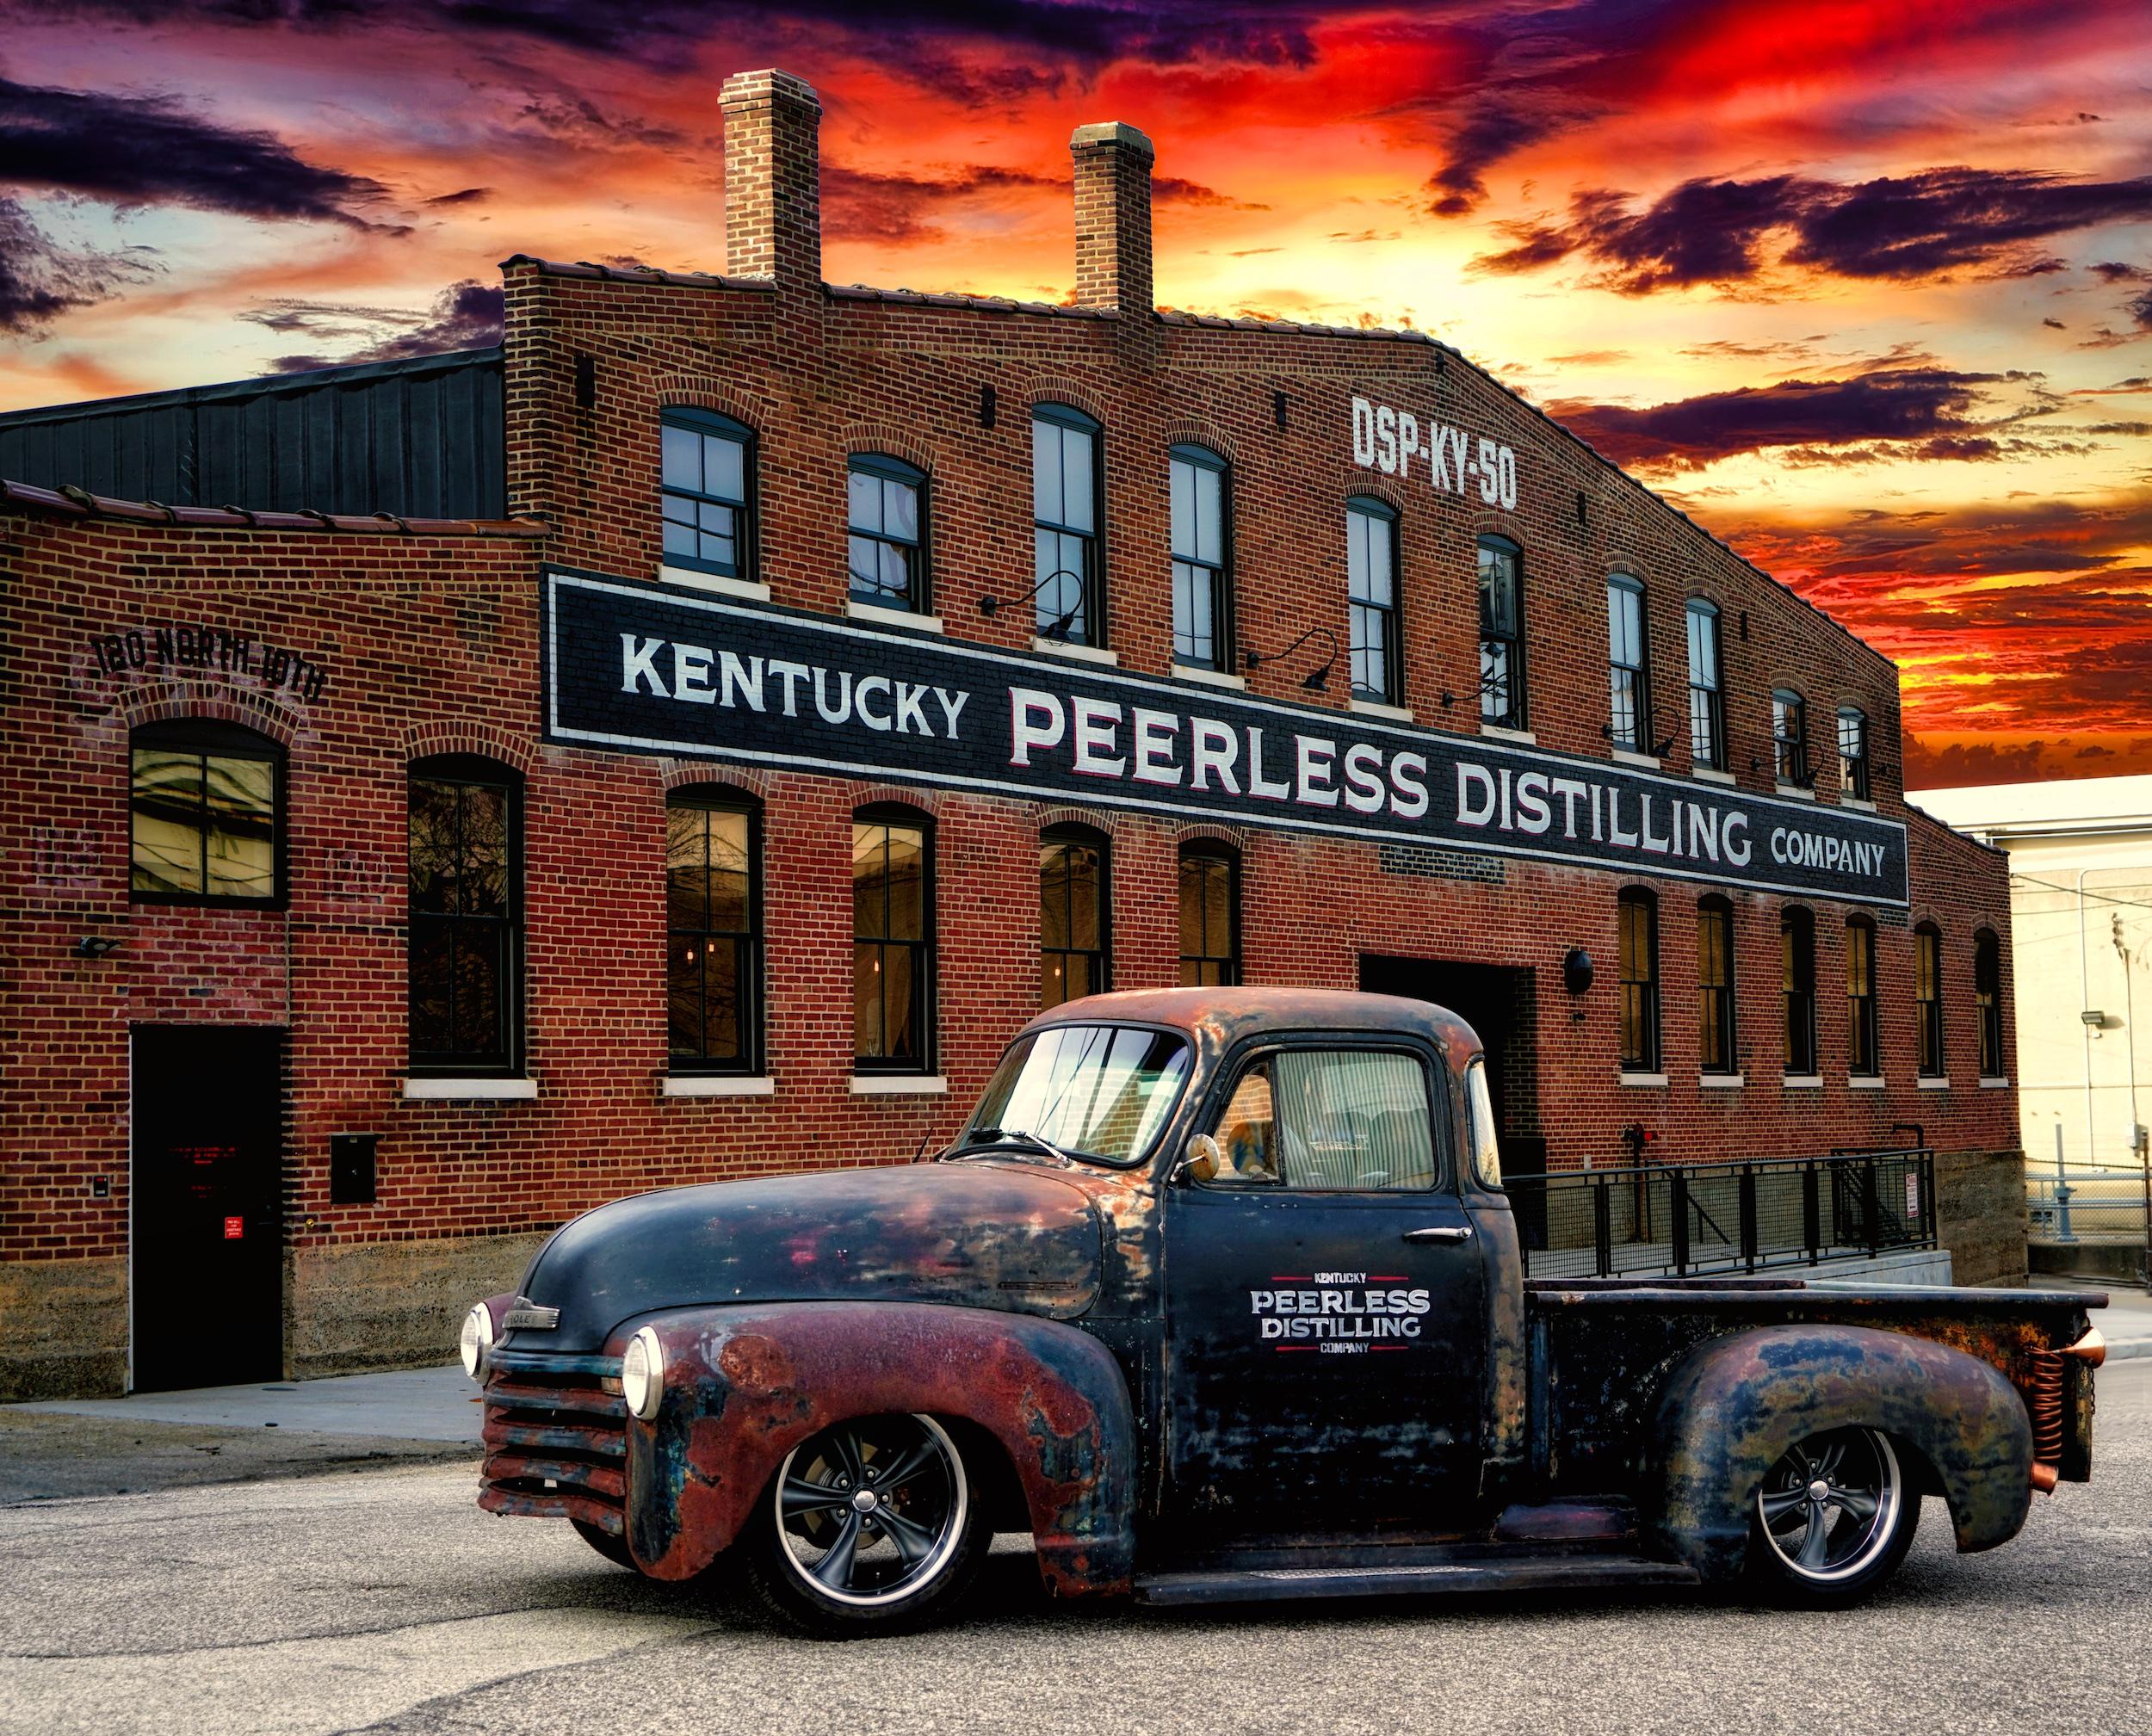 KY - Distillery